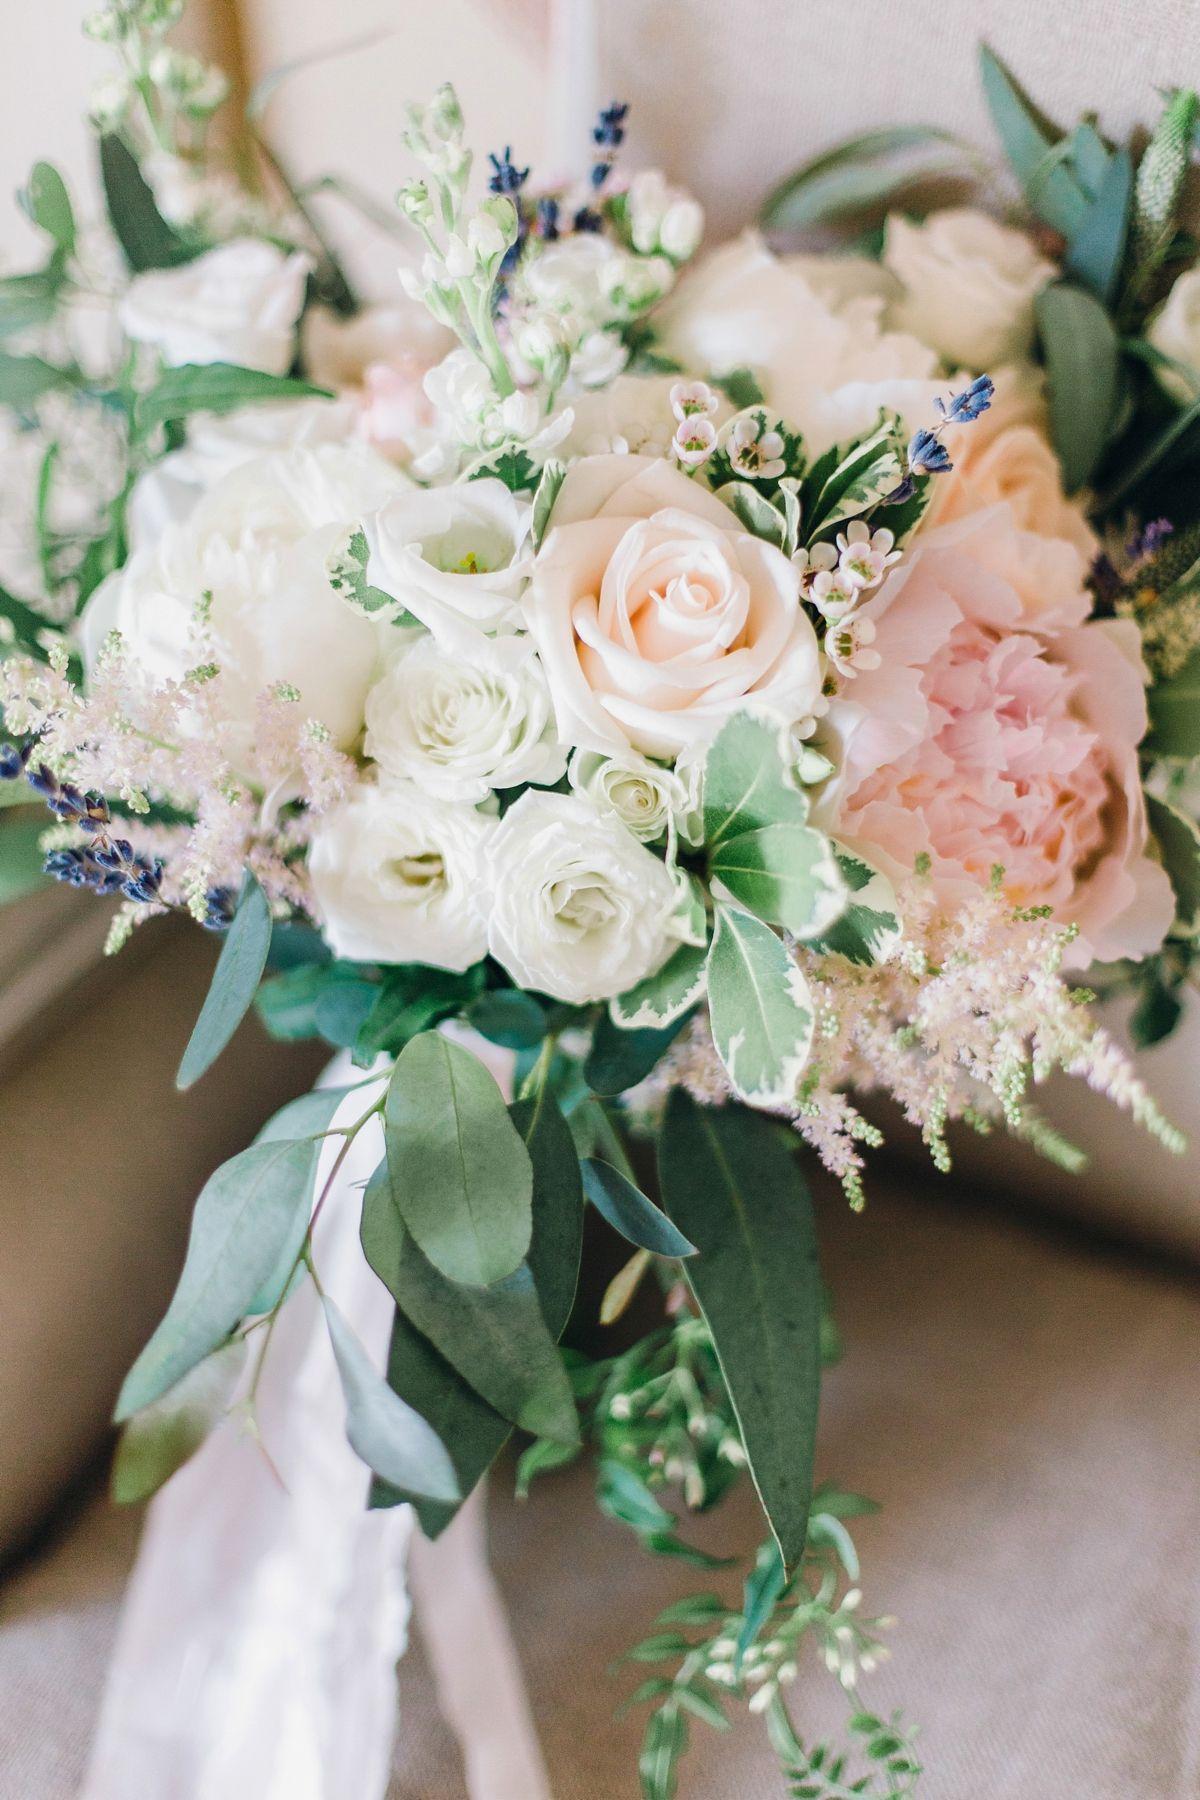 Enzoani Romance for an Elegant English Country Wedding at Askham ...